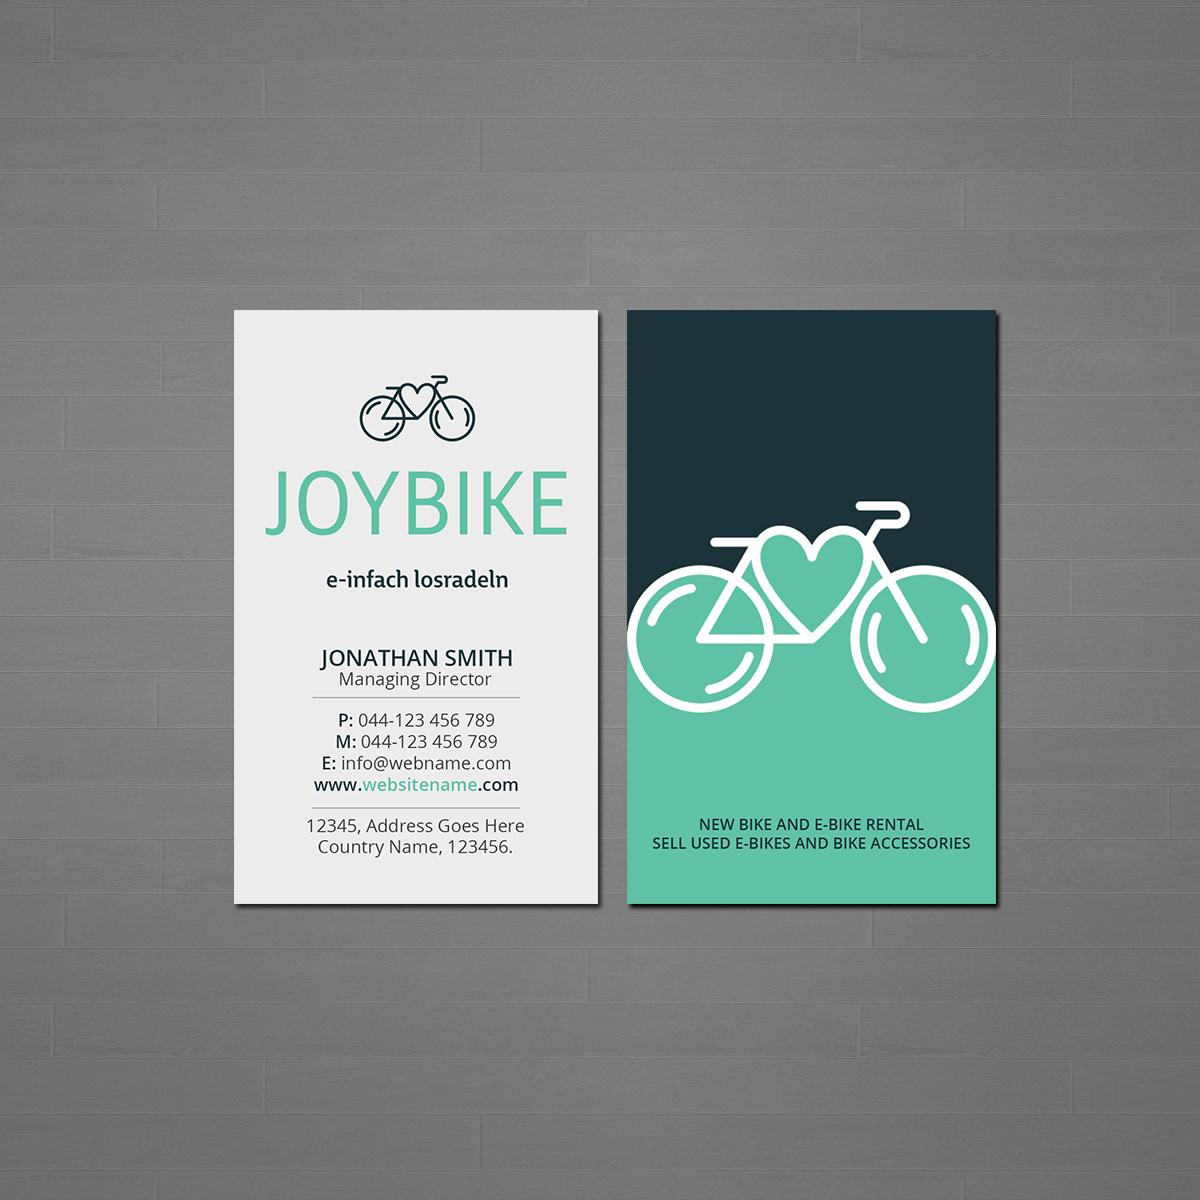 Visitenkarten Für Joybike 136 Business Card Designs For